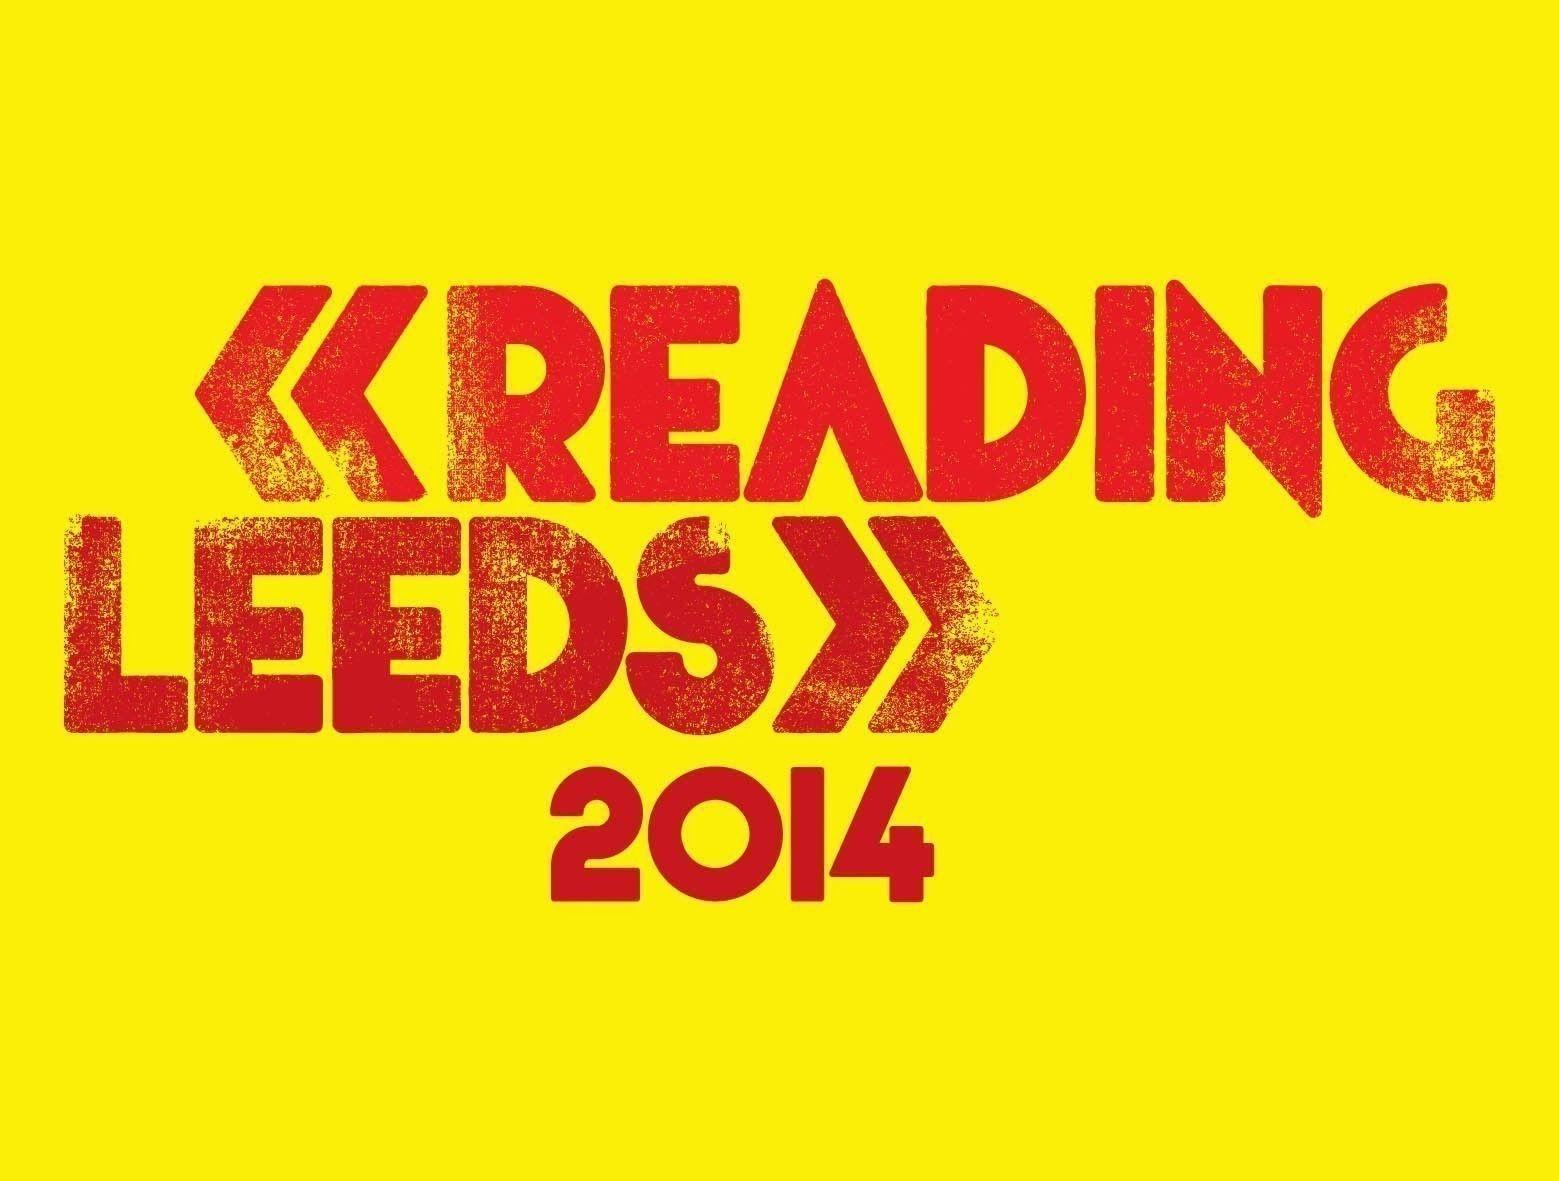 randl-2014-logo-yellow.jpg